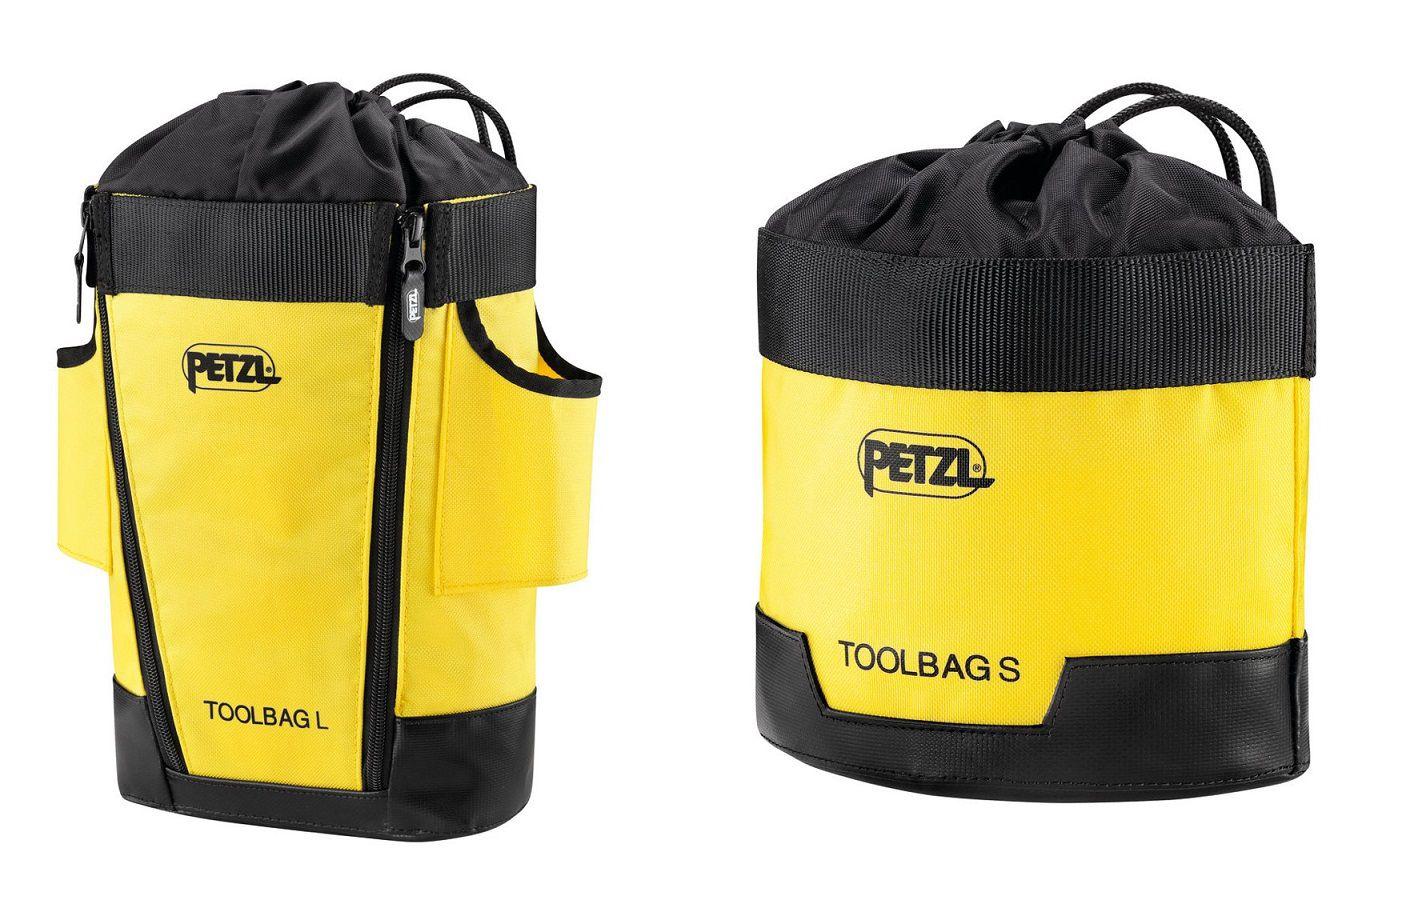 Toolbag - Pochete Porta-Ferramentas Petzl